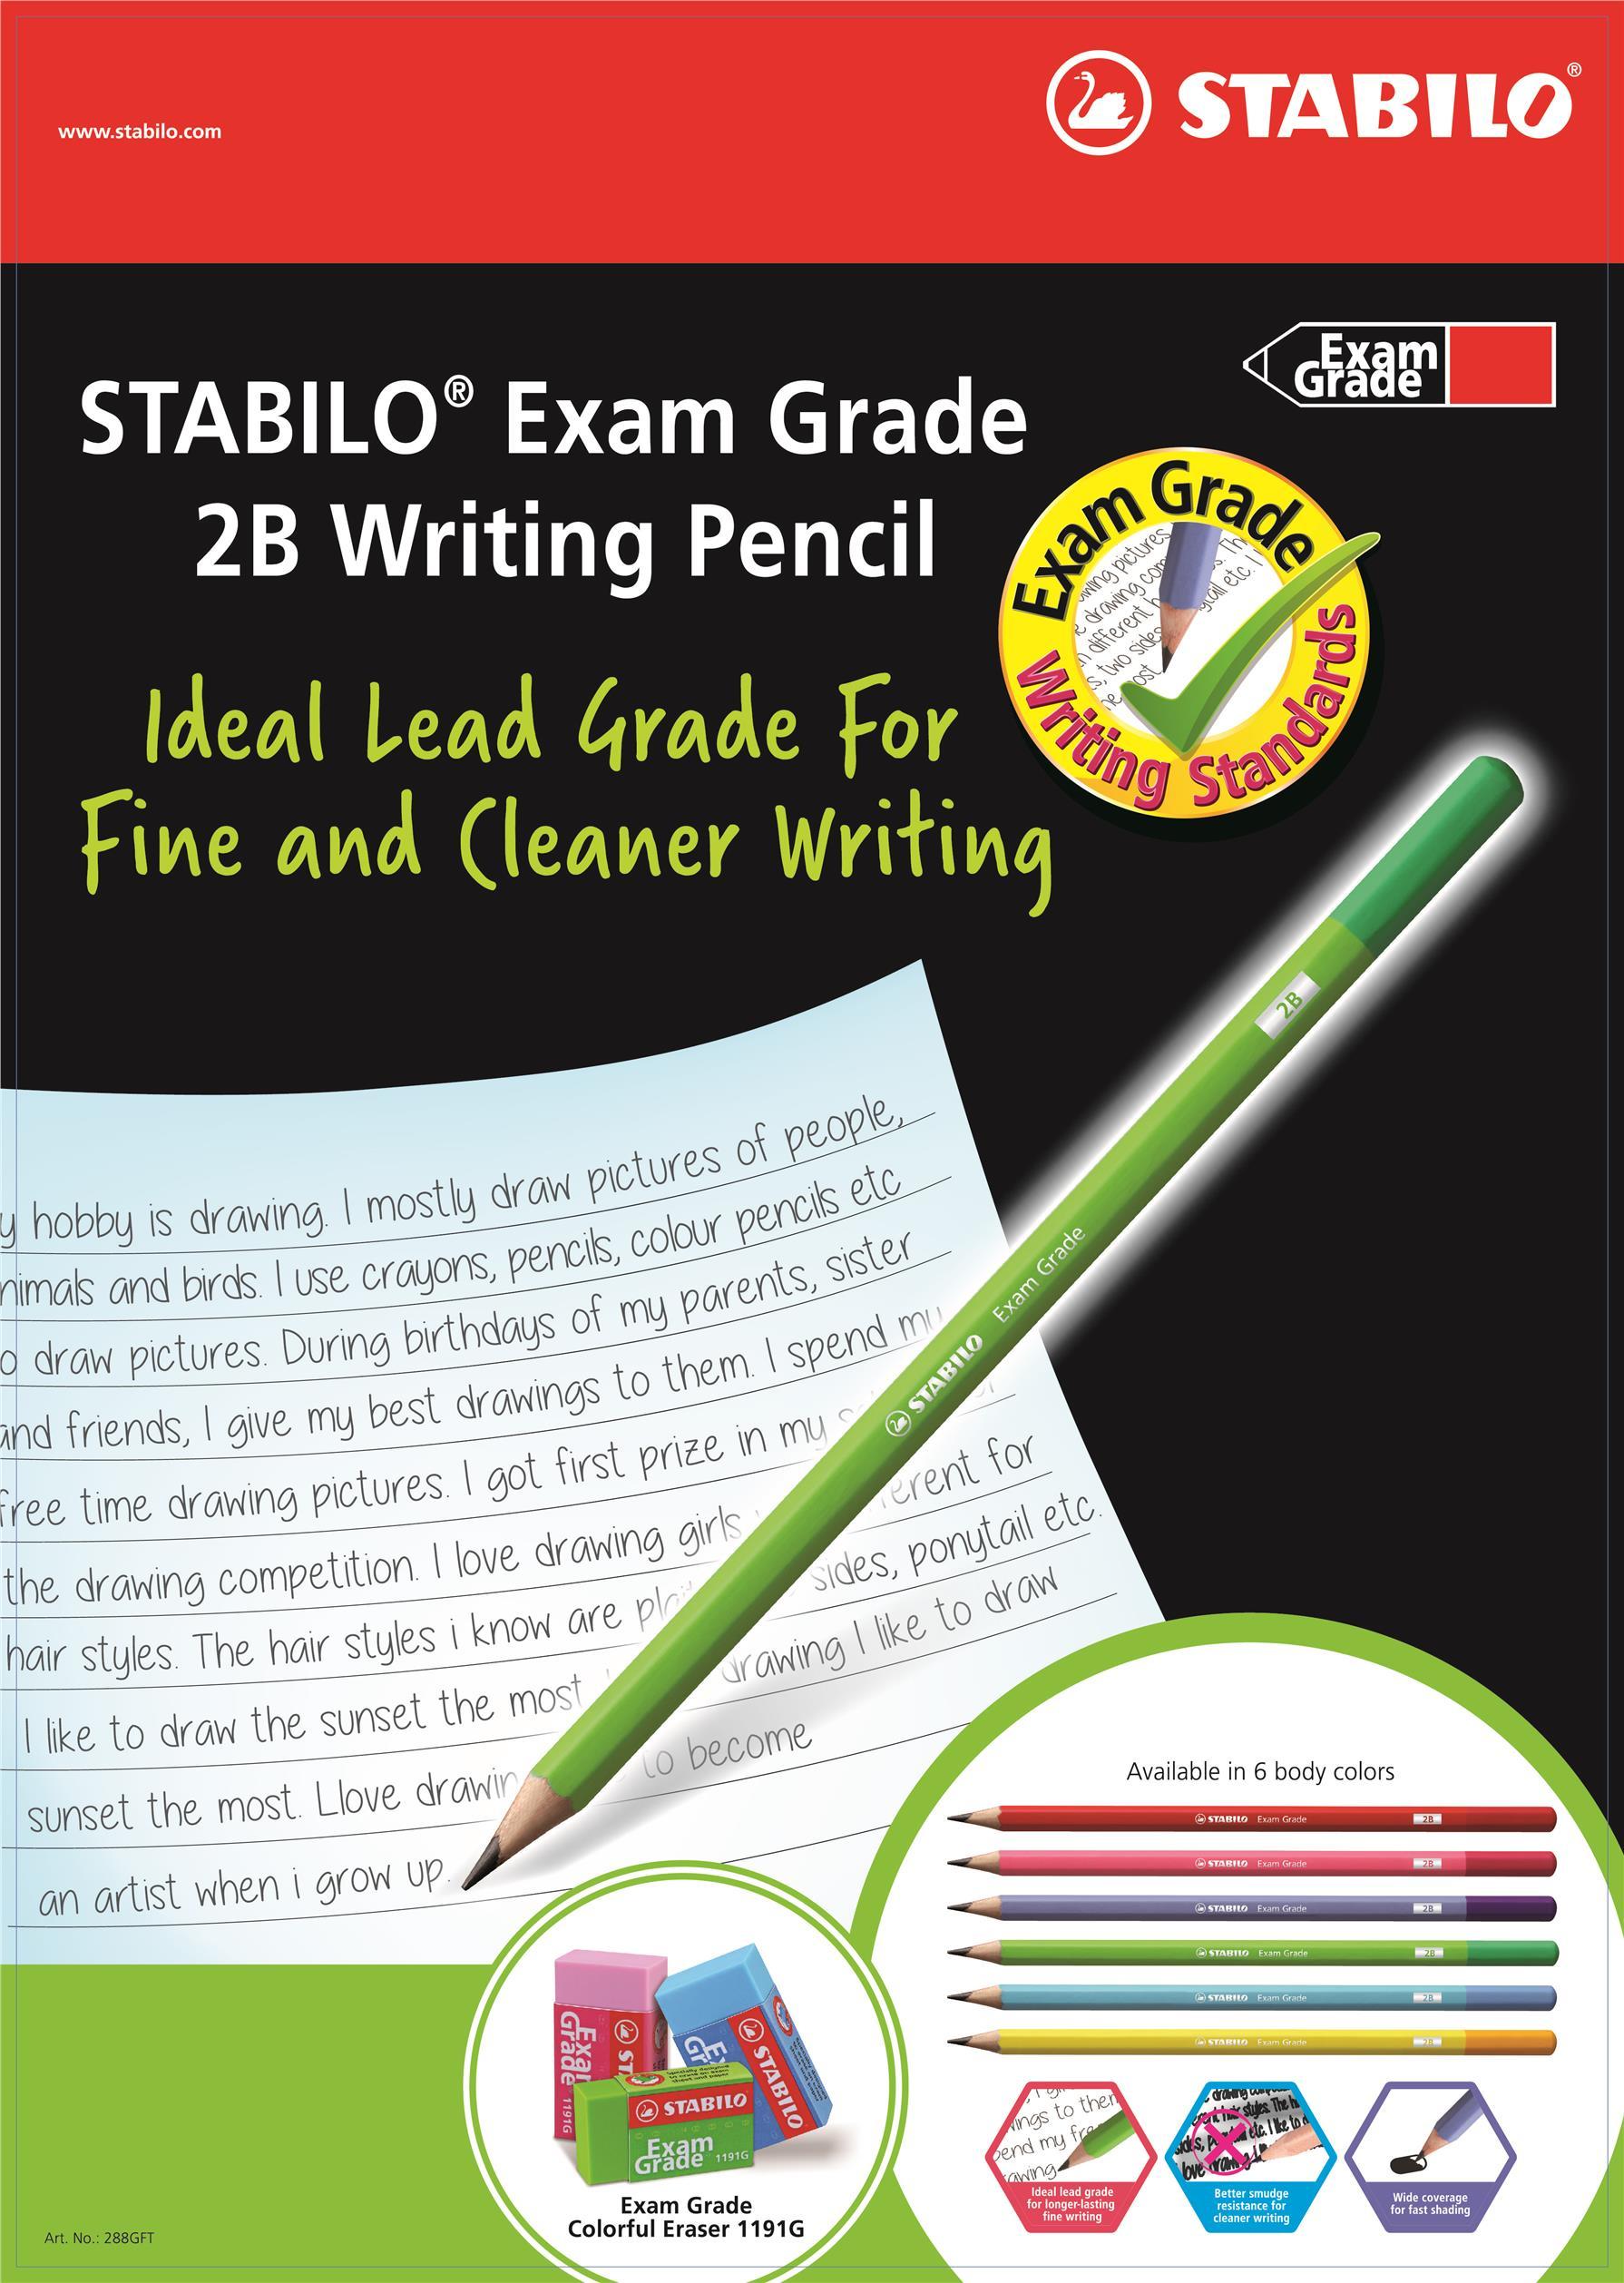 STABILO 288G Exam Grade Writing Pencil 2B (Box of 12pcs)